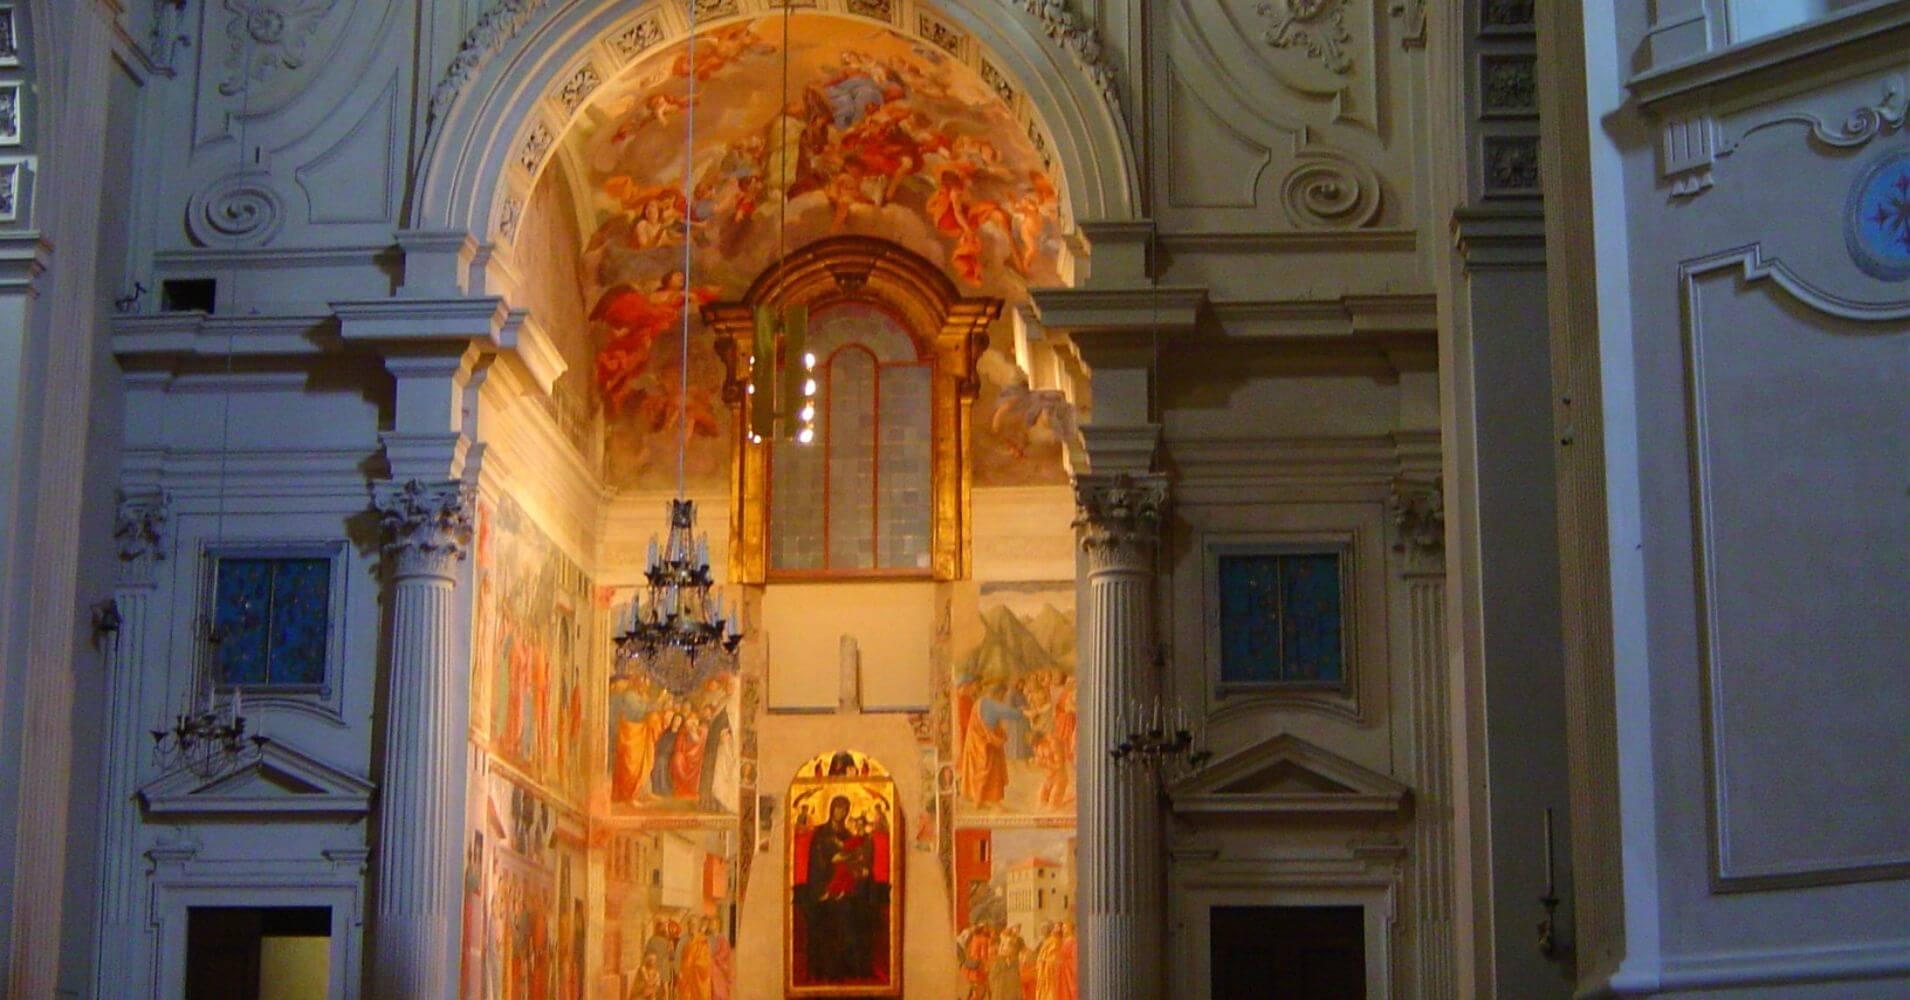 Capilla Brancacci Masaccio, Santa María Carmine. Toscana, Italia.